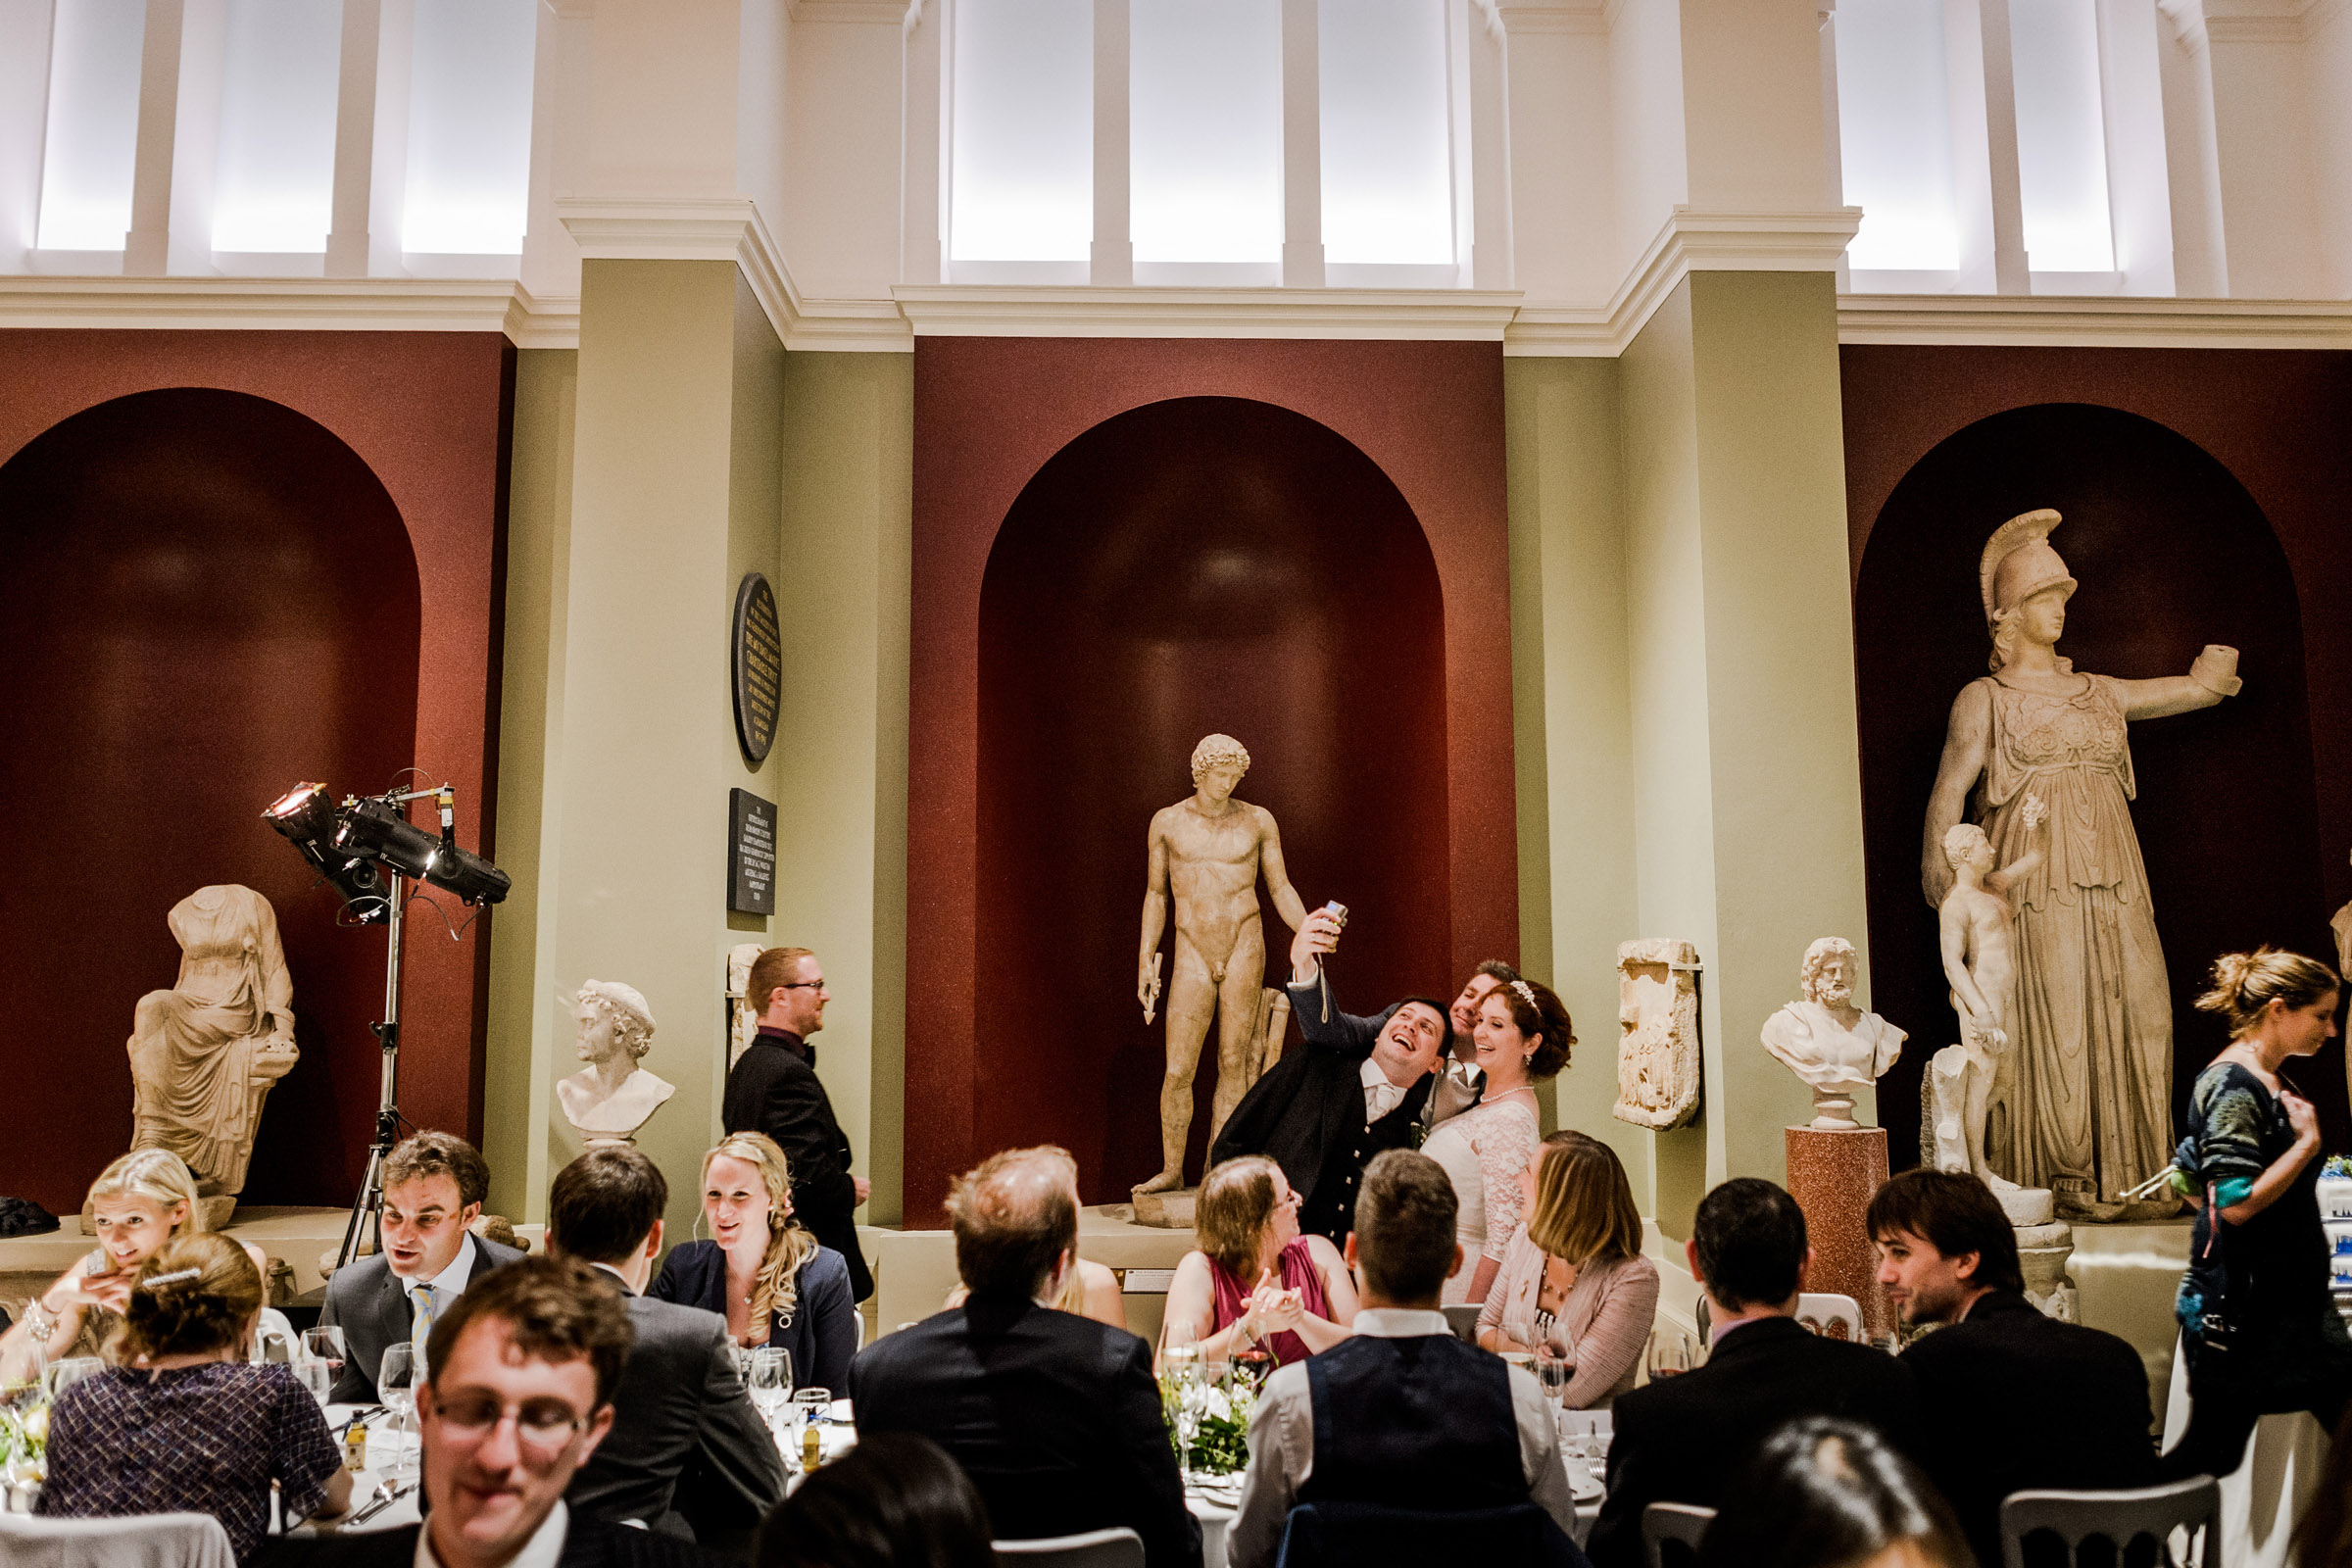 Ashmolean-Museum-Wedding-Pictures-0050.jpg